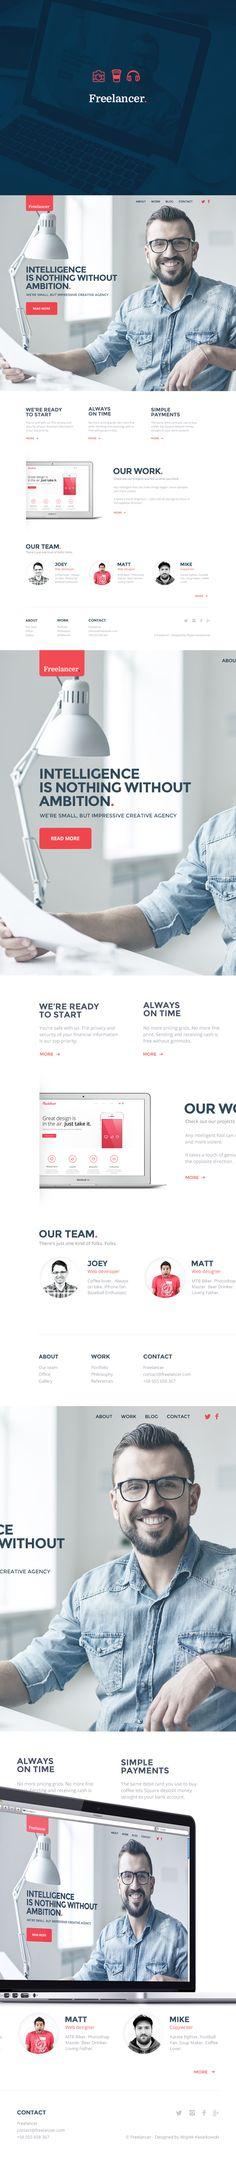 nice & clean web design www.renowebdesigner.com